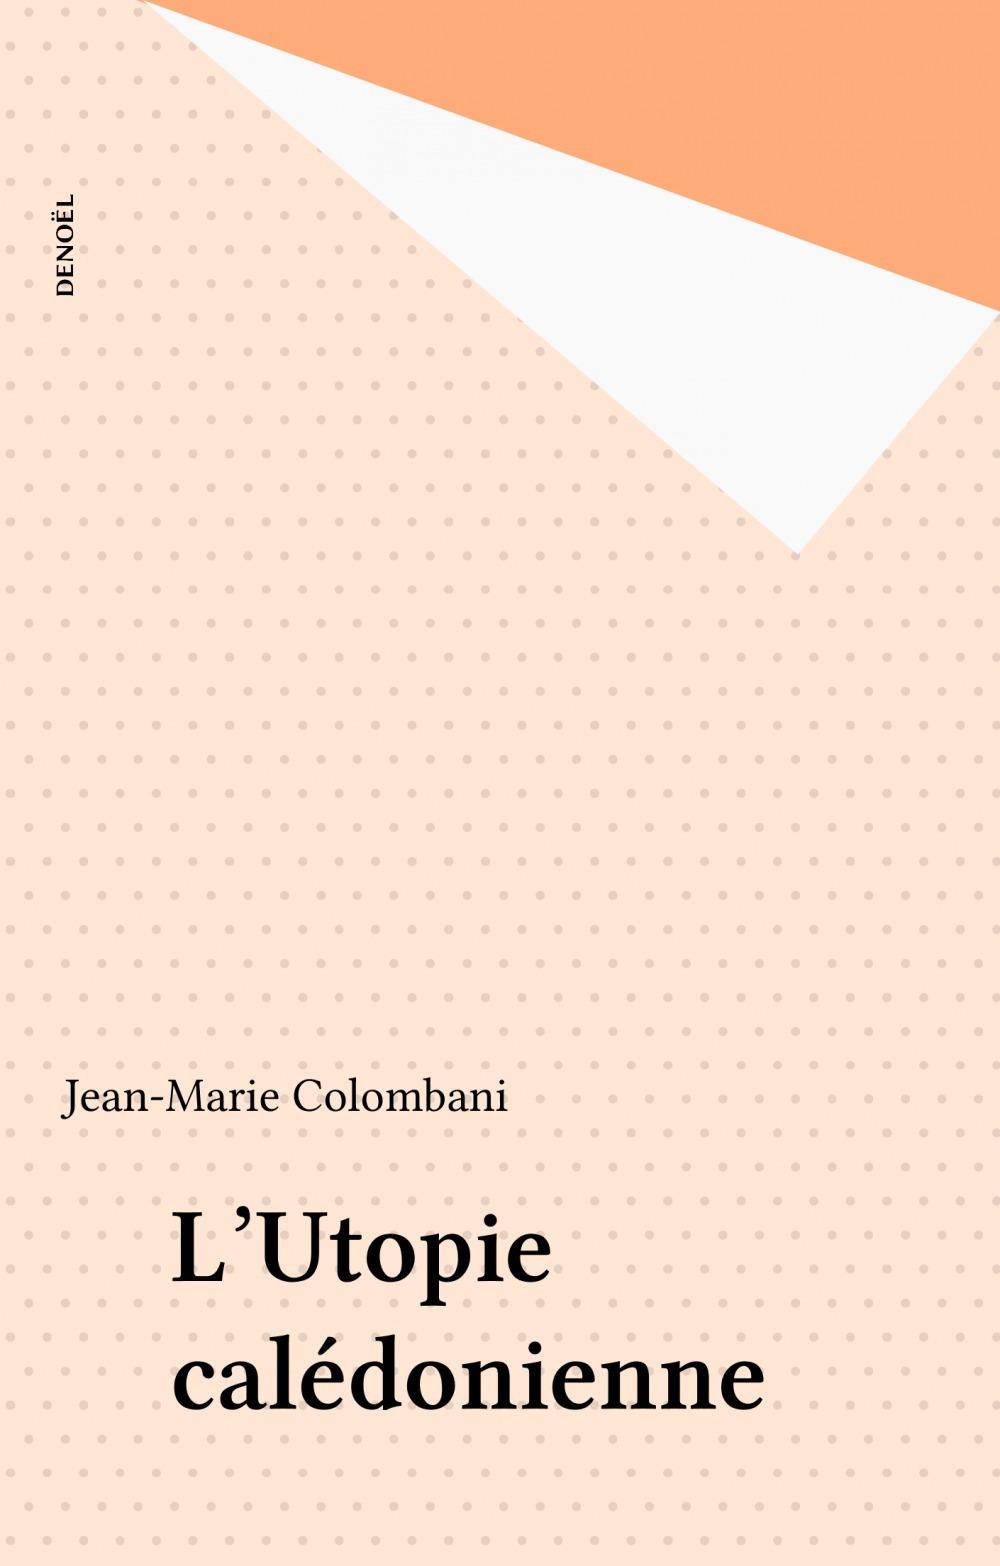 L'utopie caledonienne